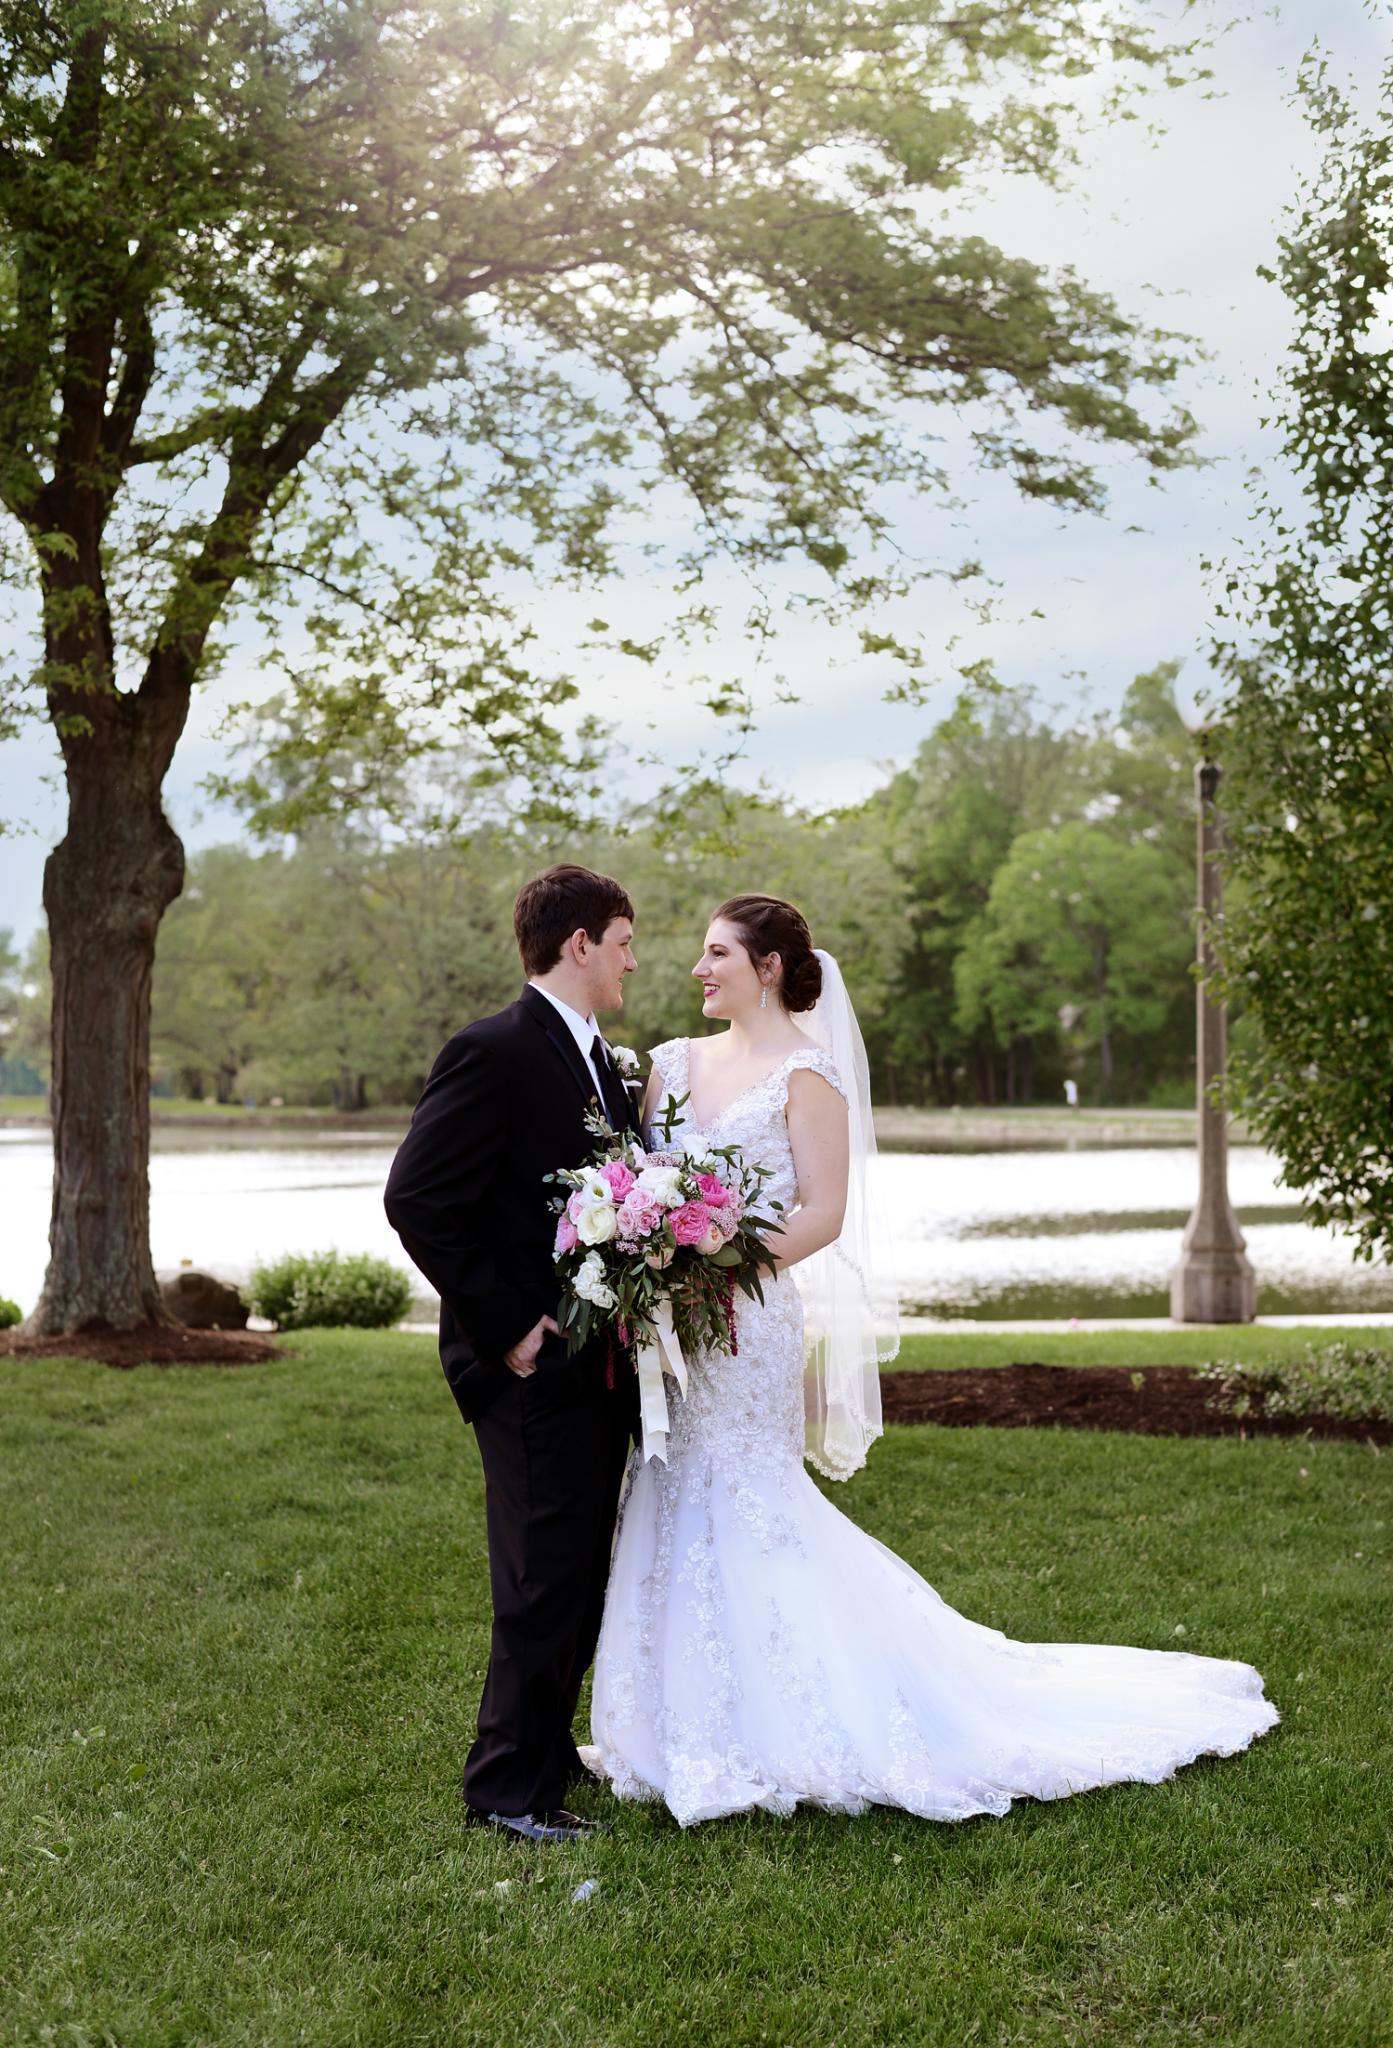 Taylor & Mike | Wedding | Sharon First United Methodist Church | Buhl Park | The Park Inn by Raddison | Youngstown Wedding Photographer